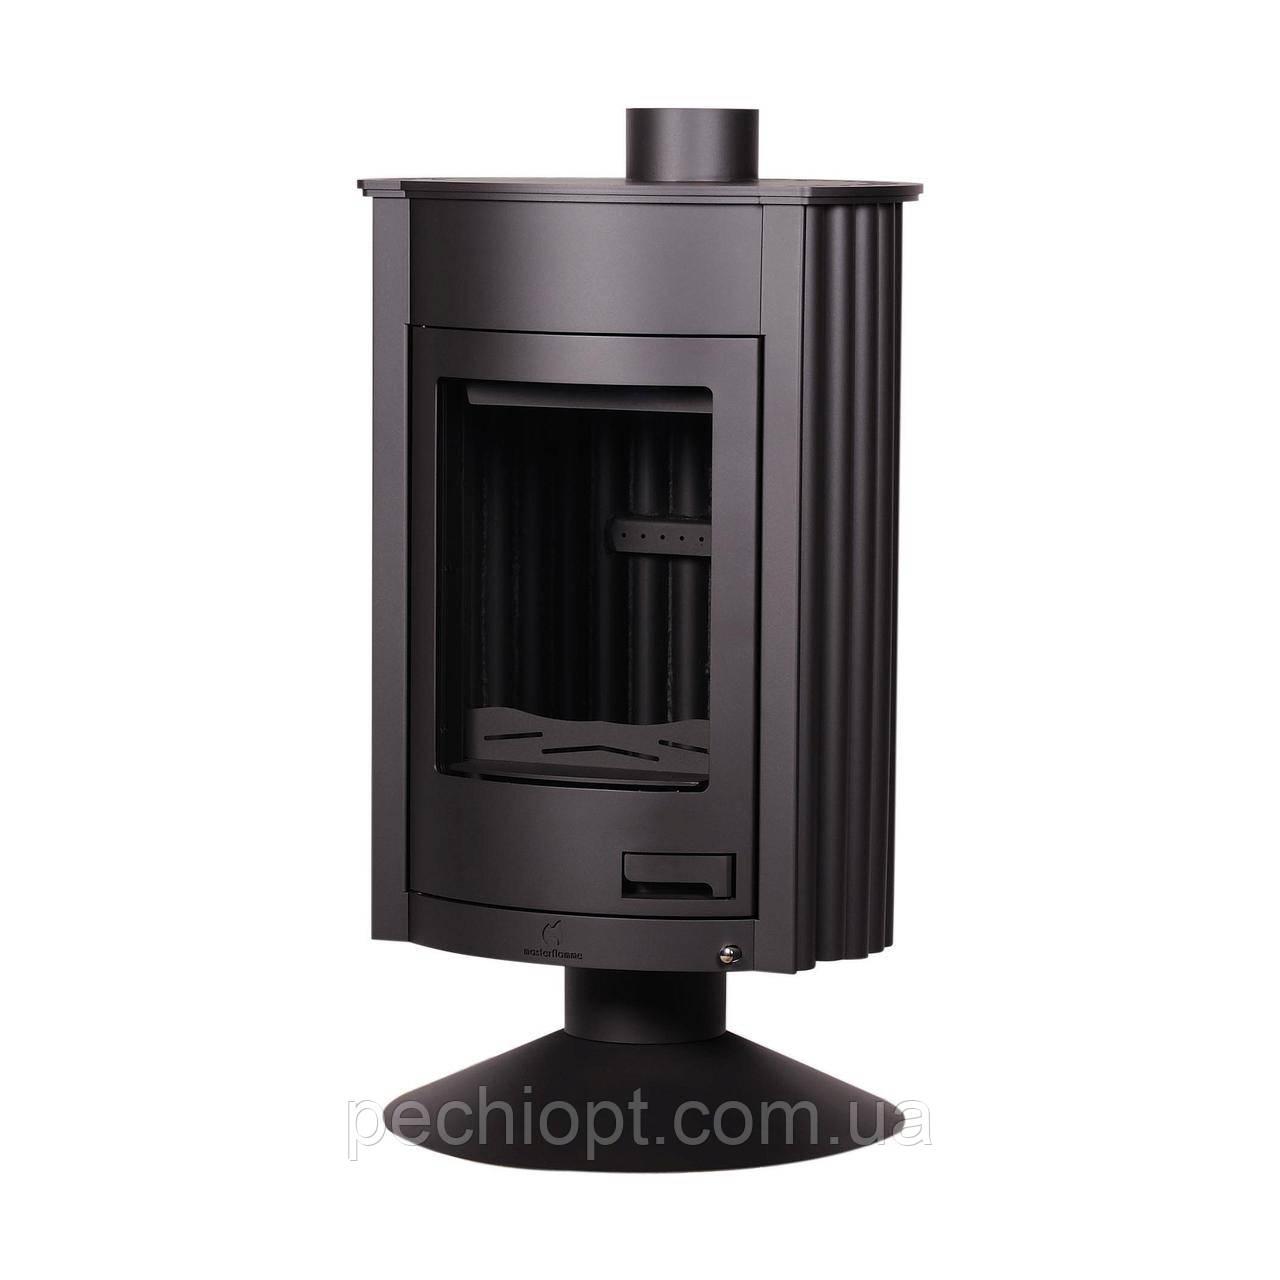 Отопительная печь Masterflamme Medie ІI  (черный)